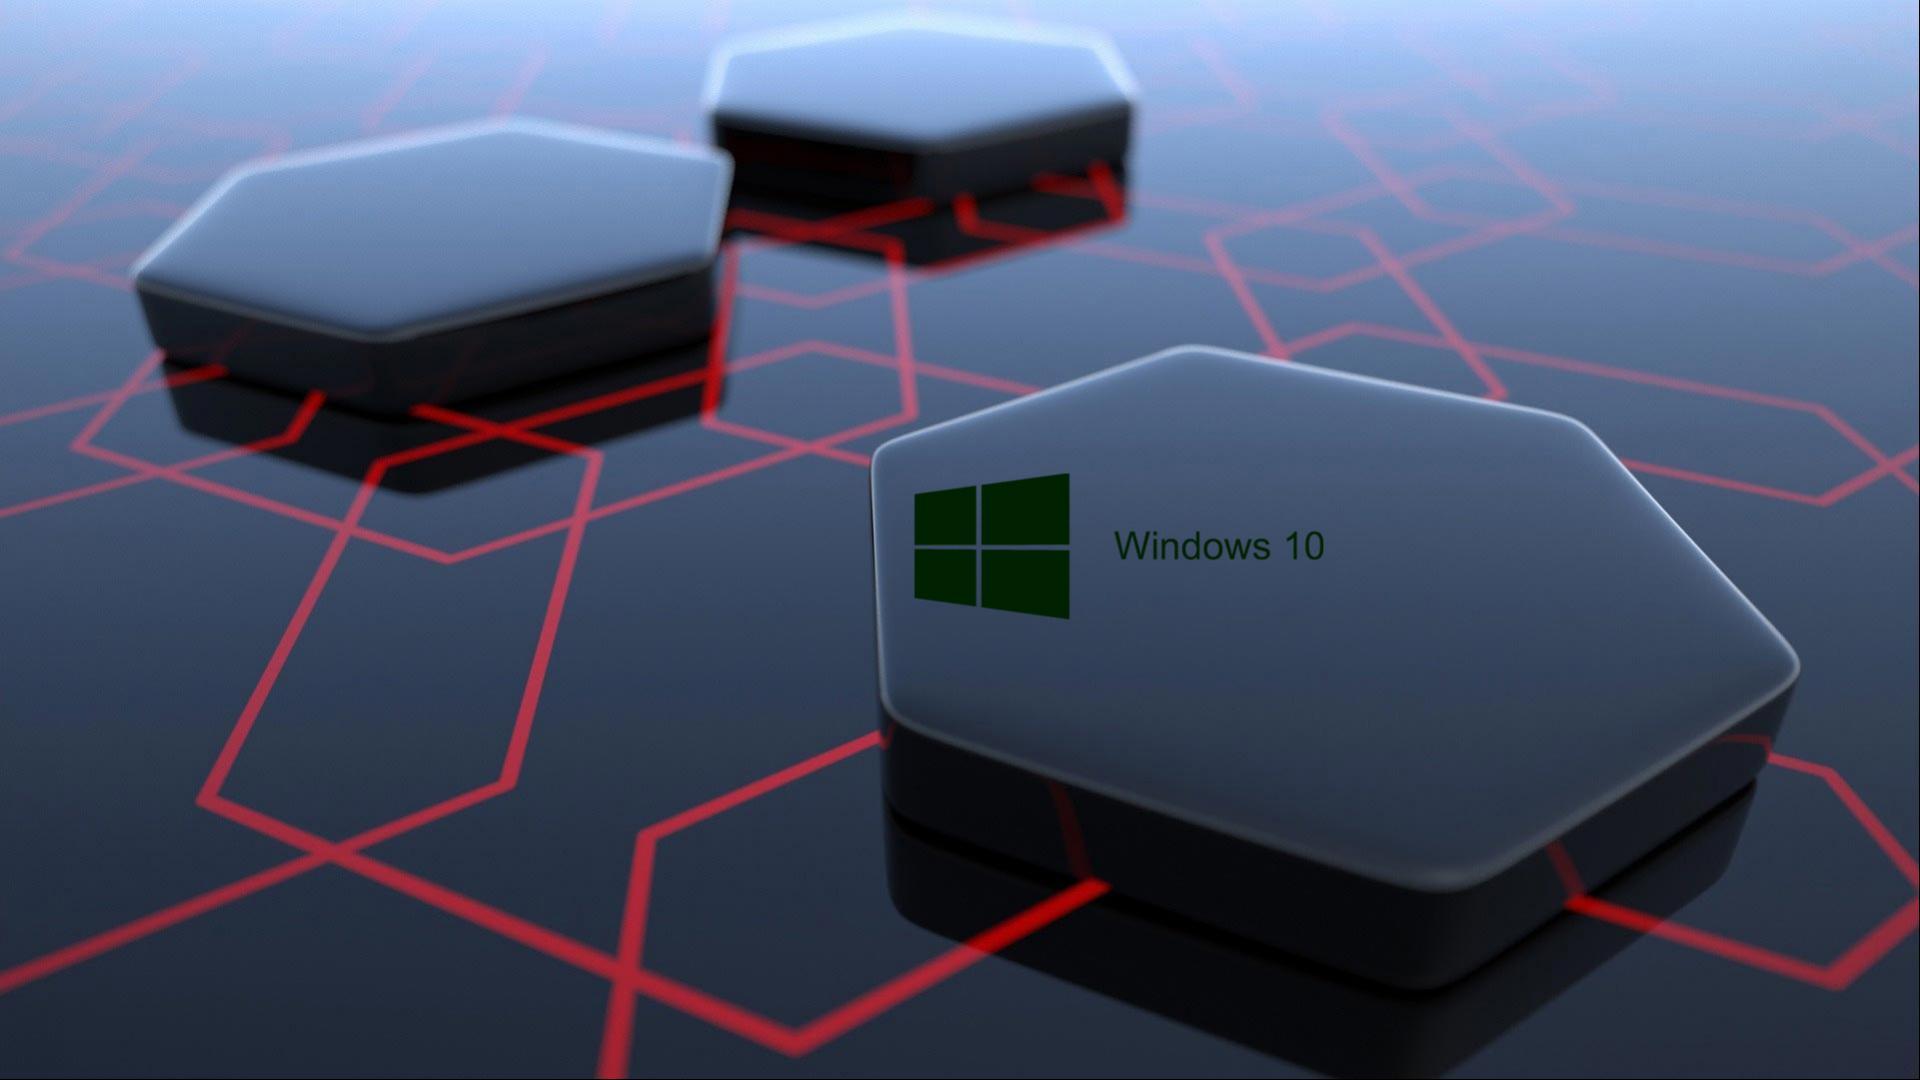 Windows 10 Desktop Image with 3d Art Black Hexagonal Wallpapers HD 1920x1080